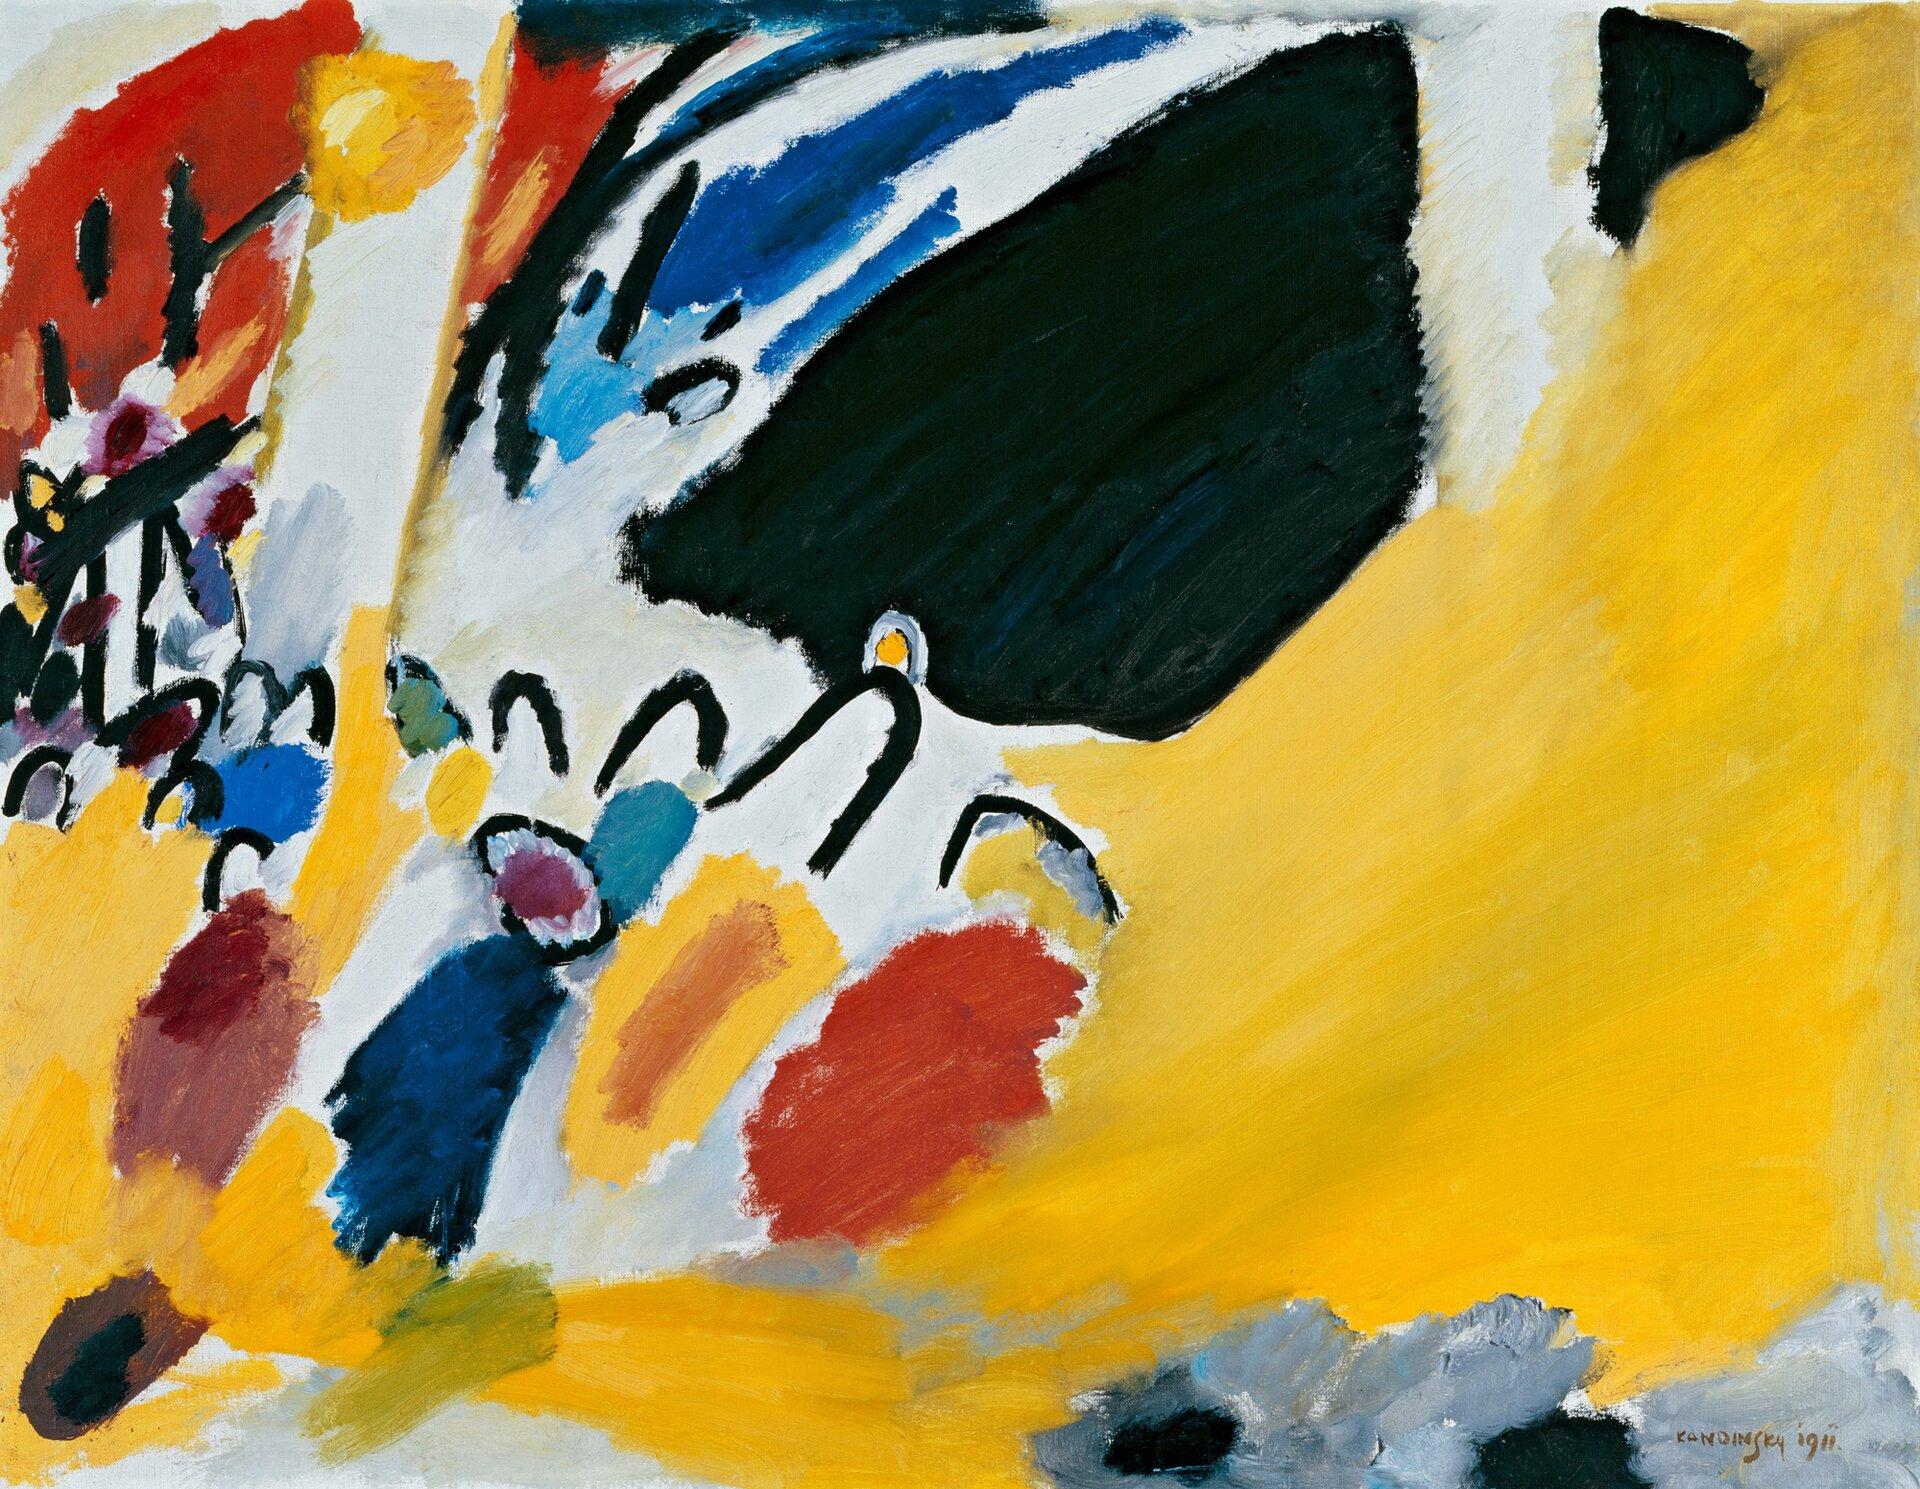 Wrażenie III (Koncert) Wasilij Kandinski,Wrażenie III (Koncert) Źródło: Wasilij Kandinski, Wrażenie III (Koncert), 1911, Städtische Galerie im Lenbachhaus, Monachium, domena publiczna.